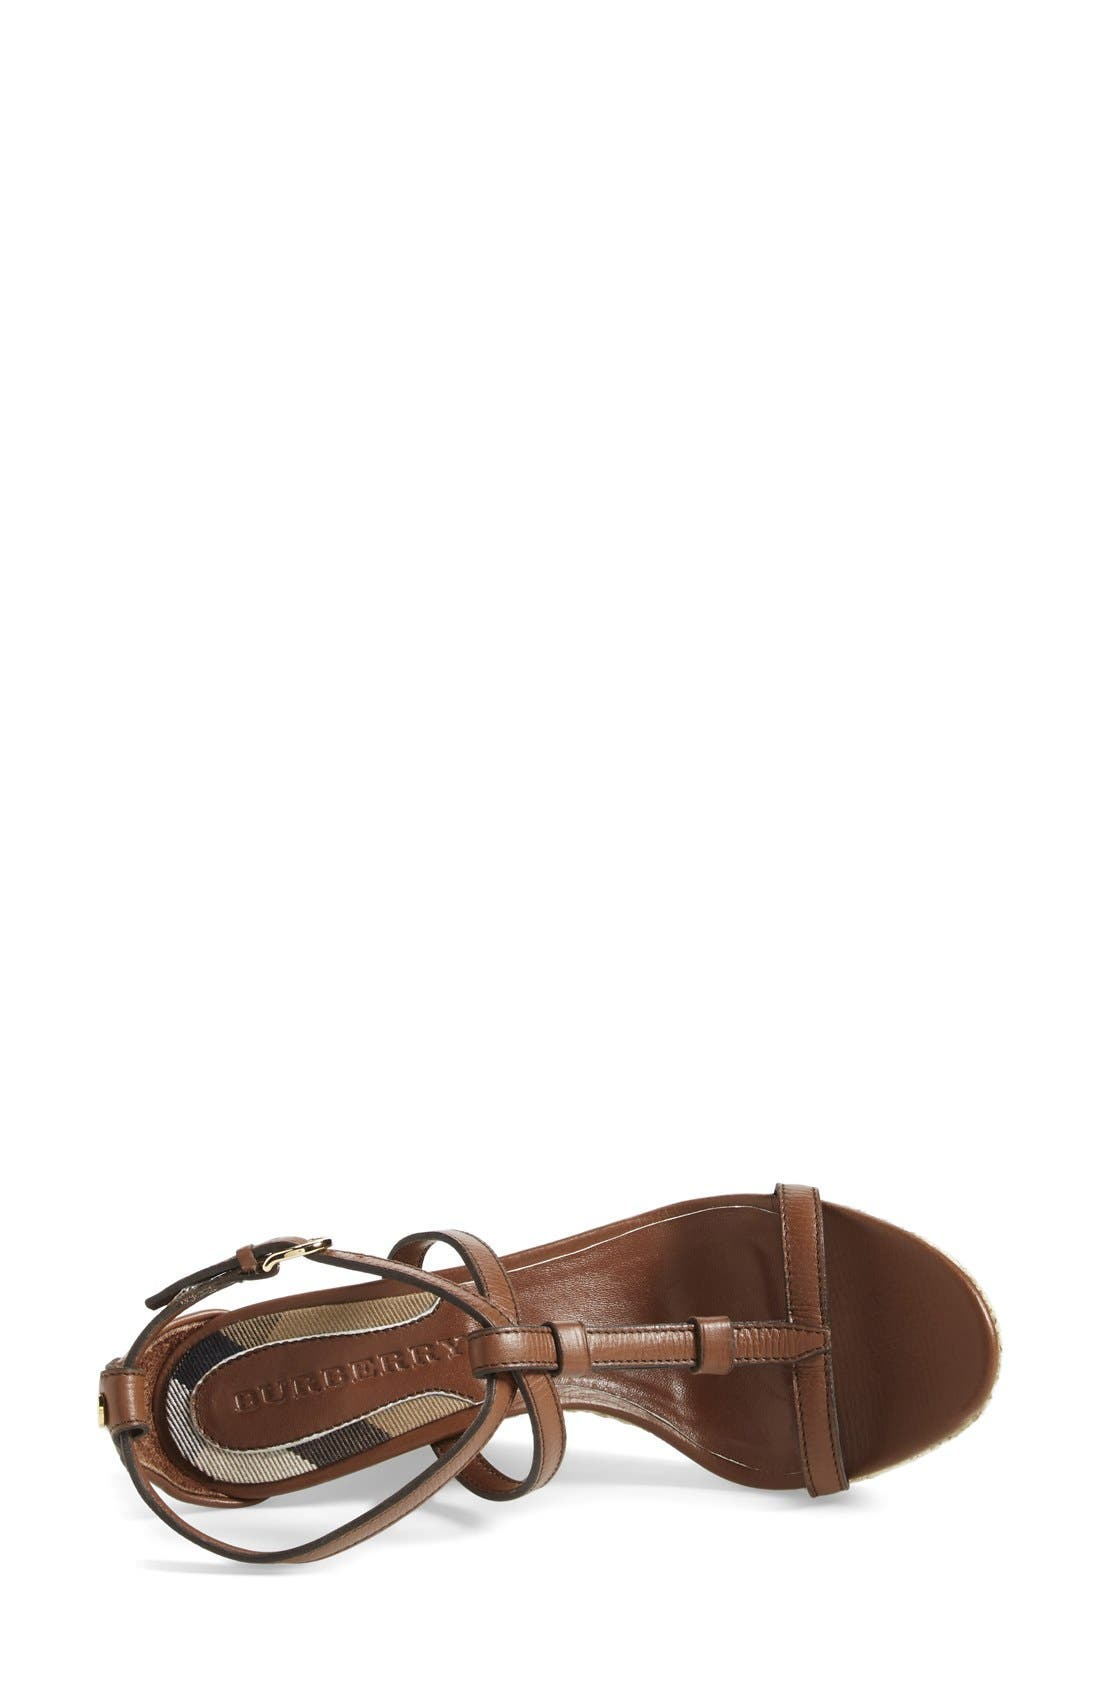 Alternate Image 3  - Burberry 'Wedland' Espadrille Wedge Sandal (Women)